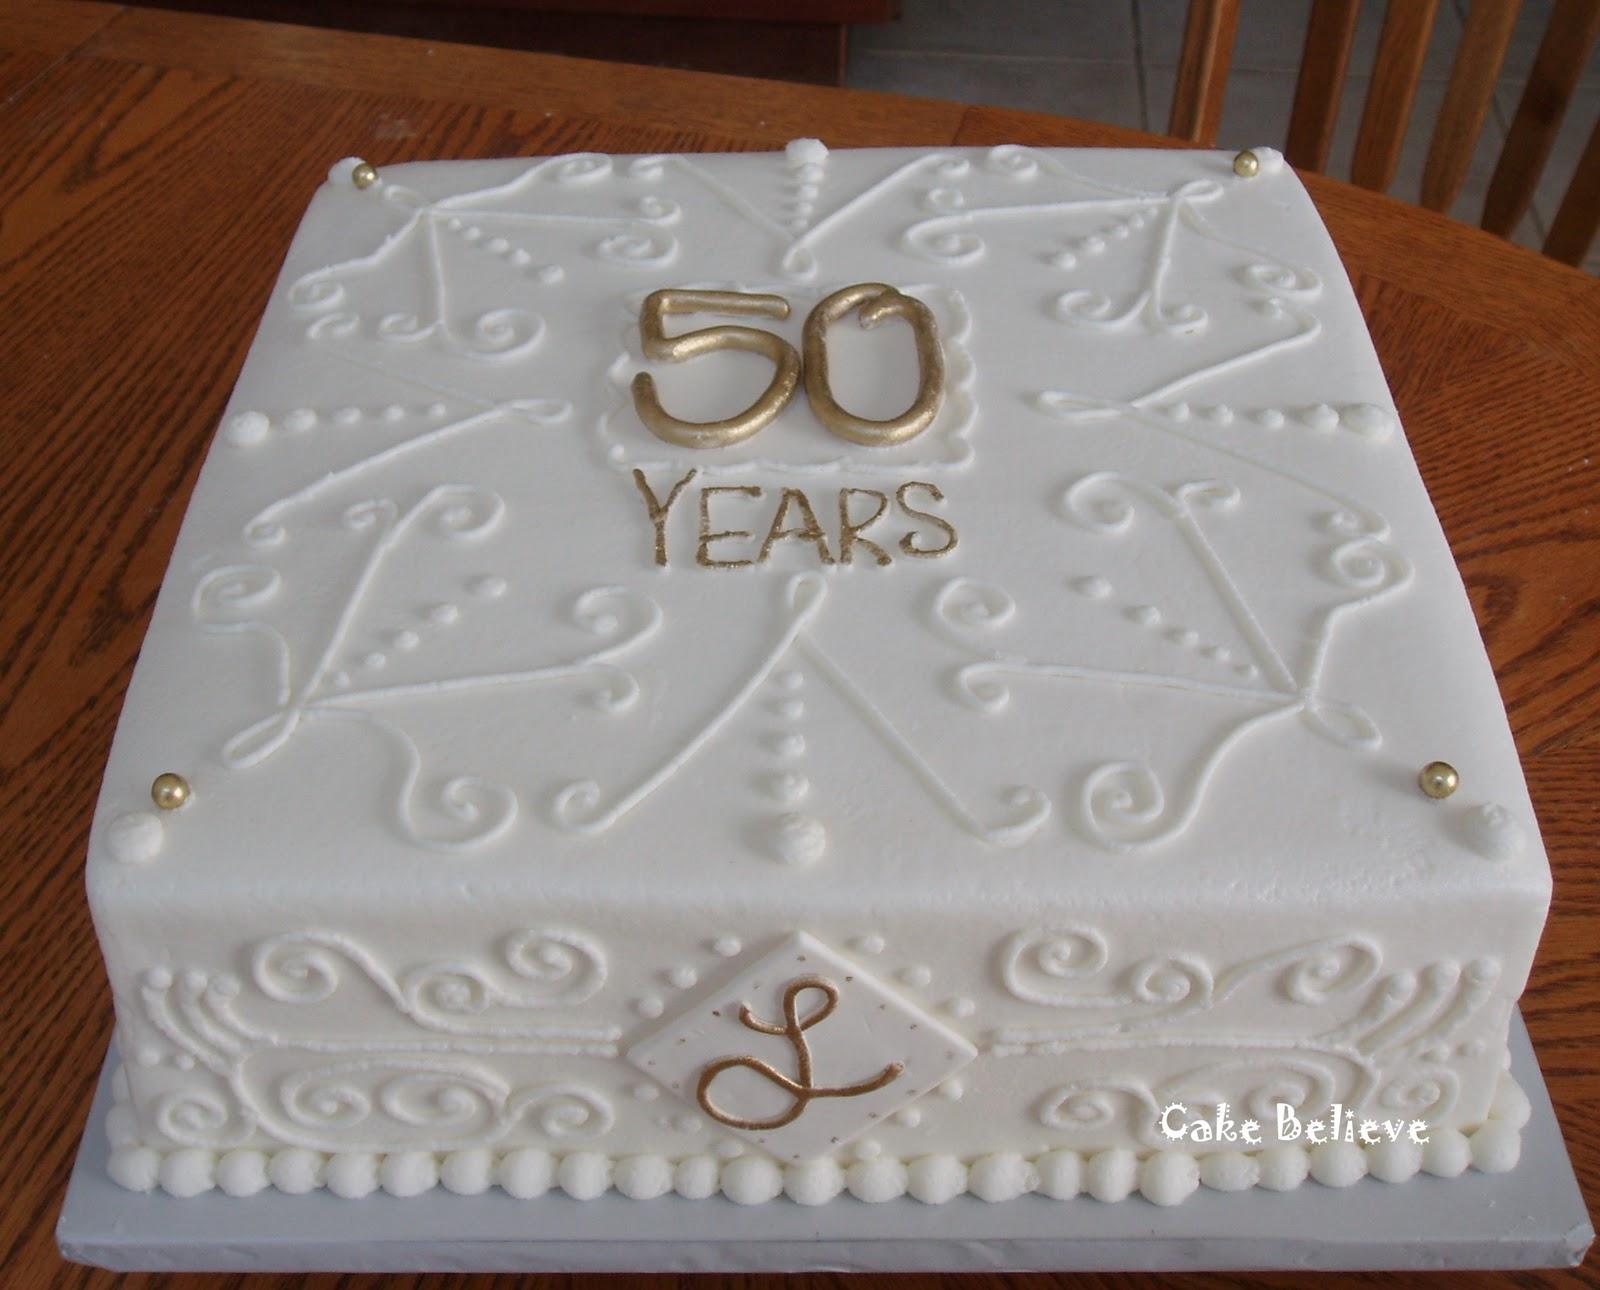 Cake Believe 50th Wedding Anniversary